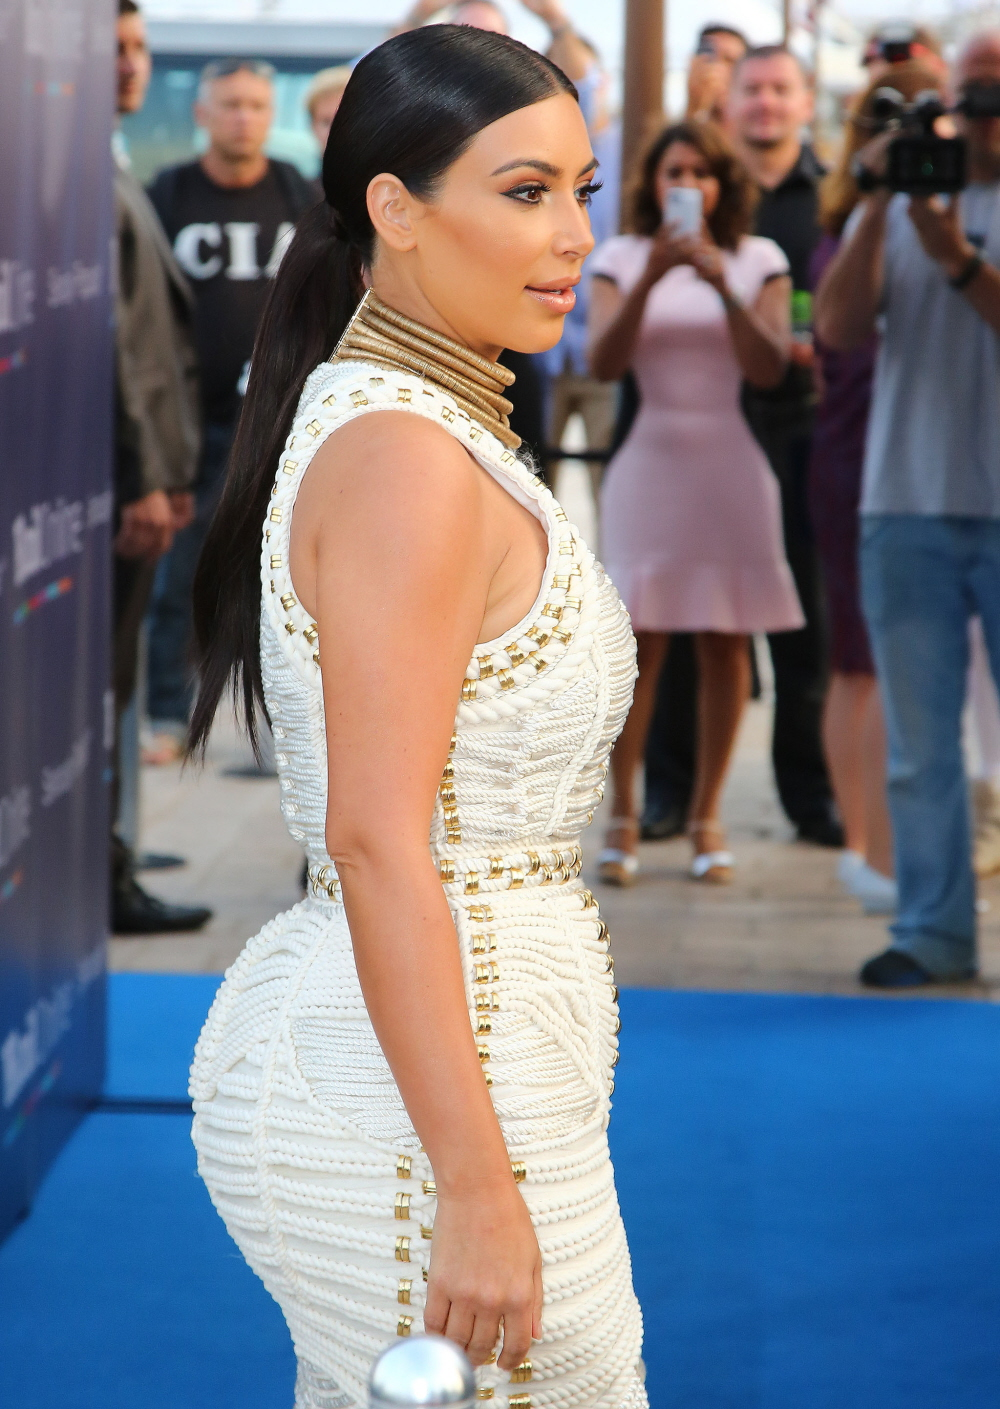 FFN_Kardashian_Kim_BRK_061814_51454742